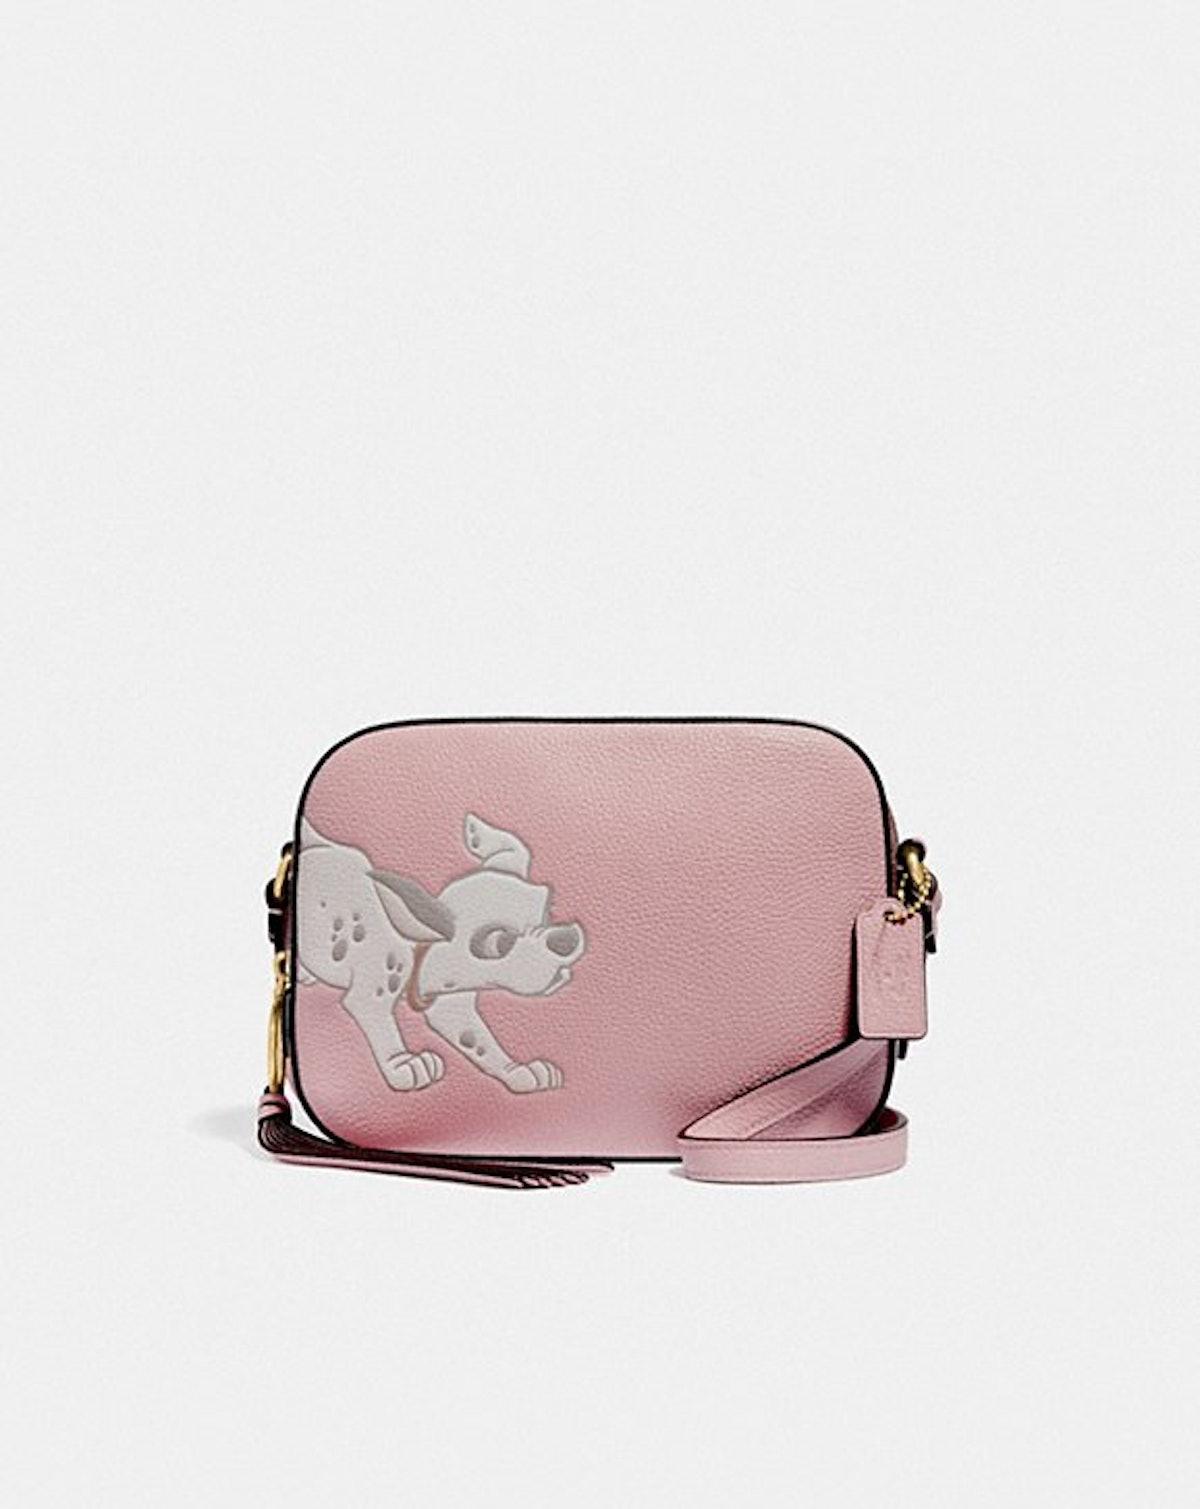 Disney X Coach Camera Bag With Dalmatian